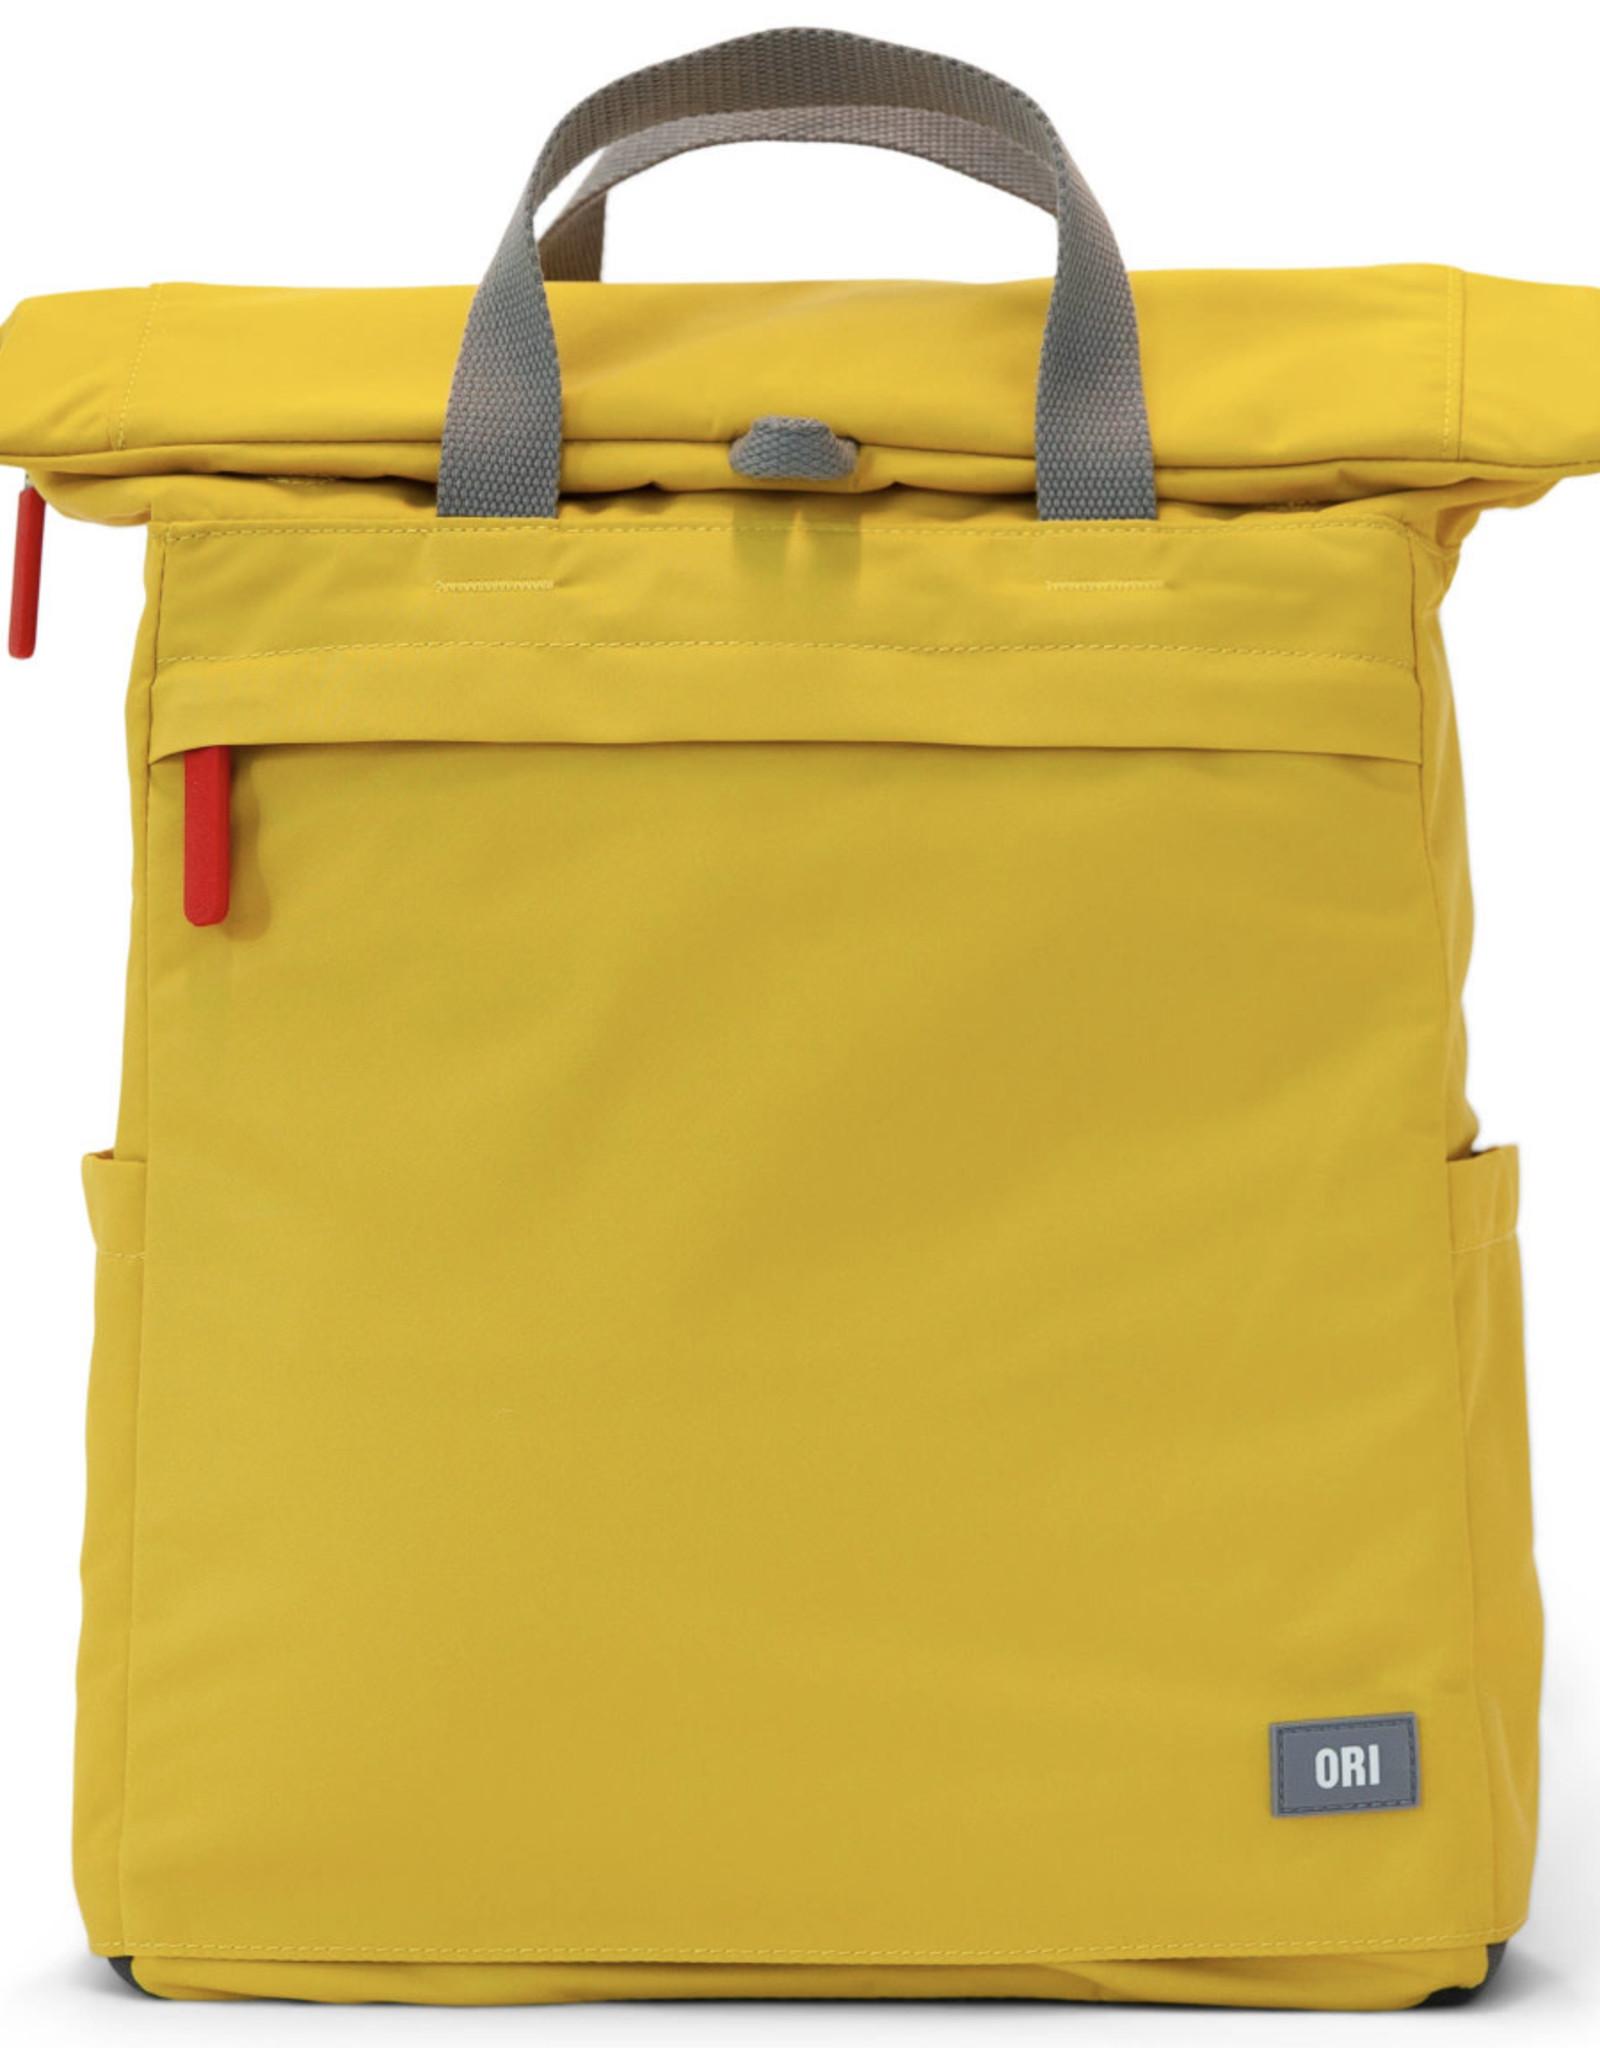 Ori London Ori Camden Limited Ed. Backpack